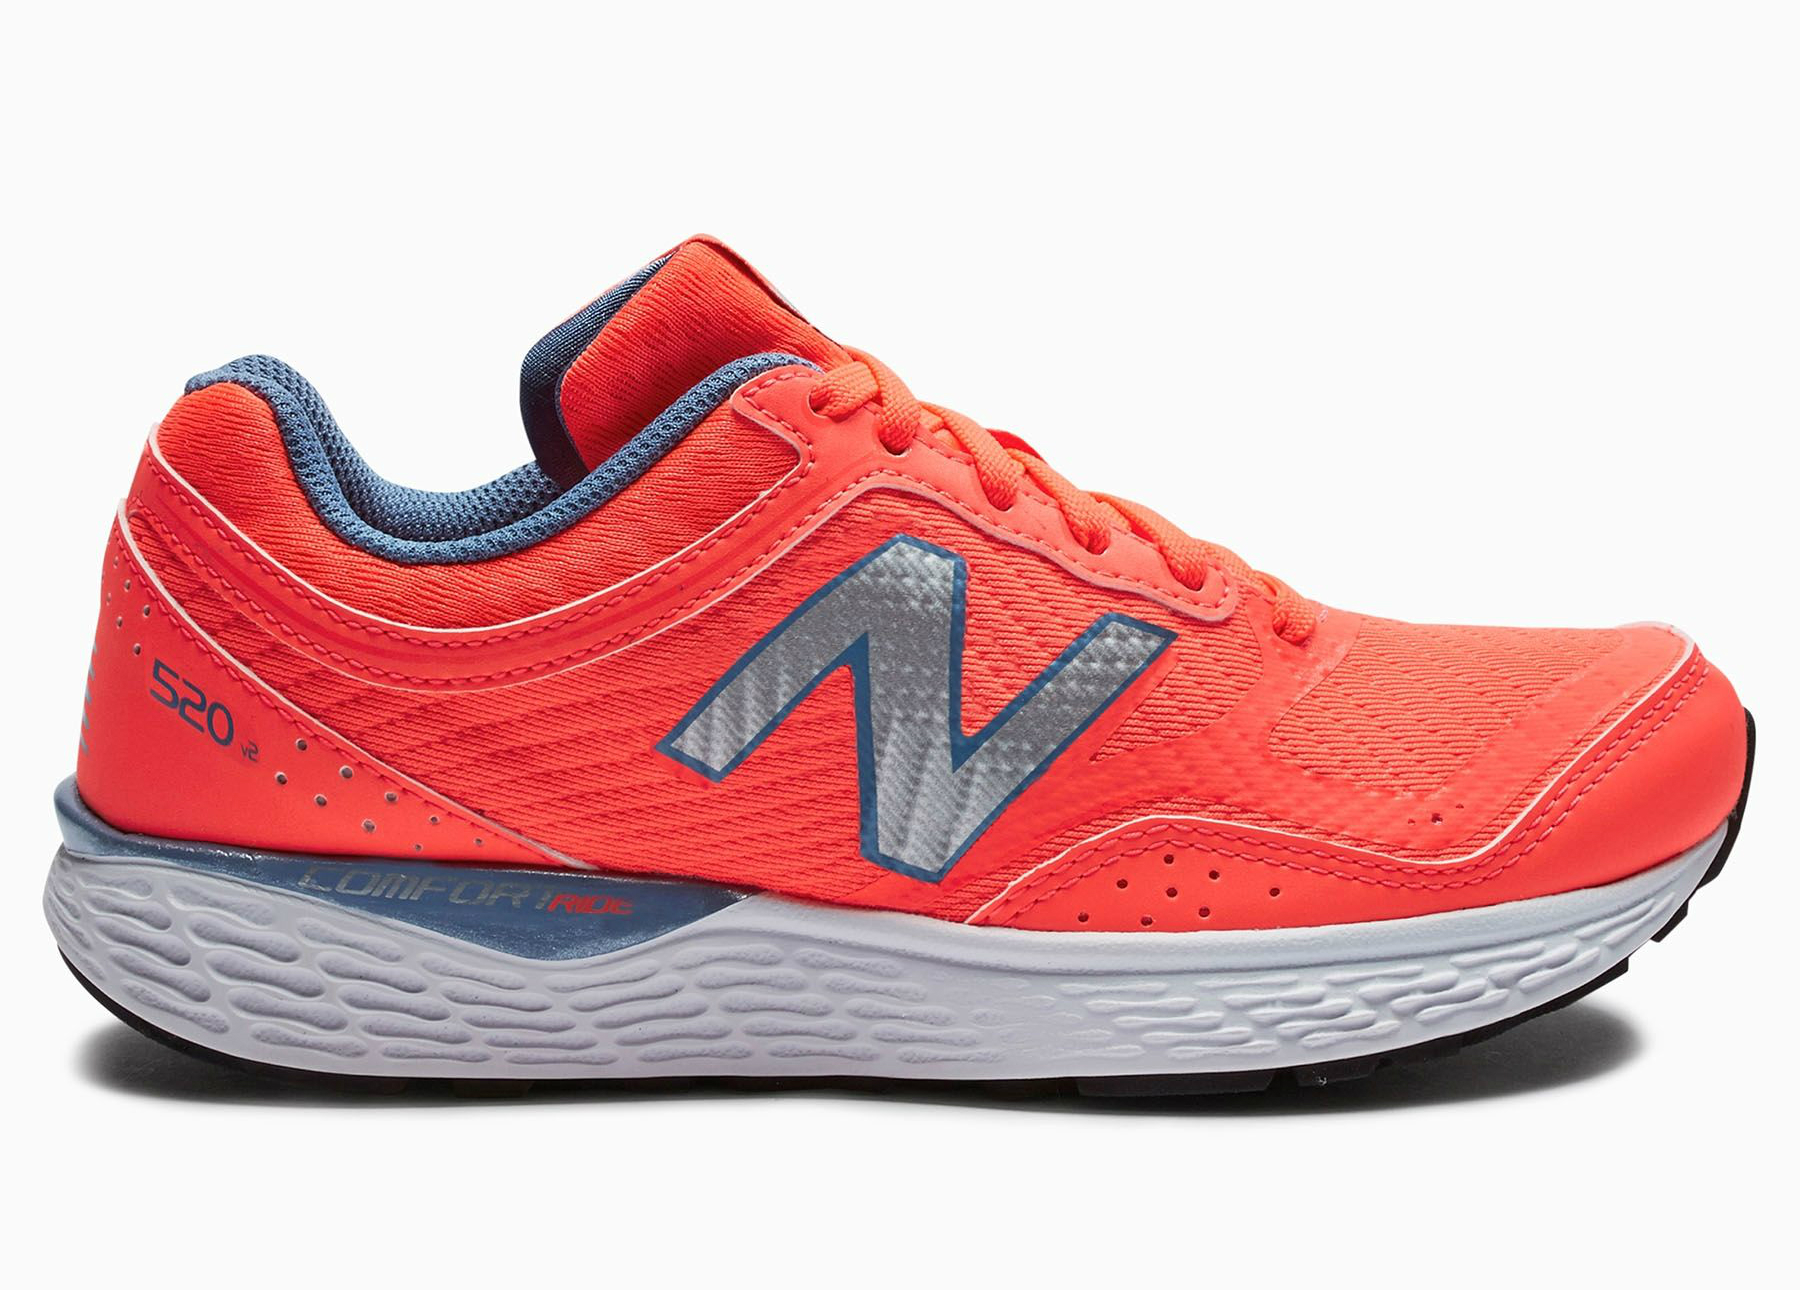 new balance 520 v2 review